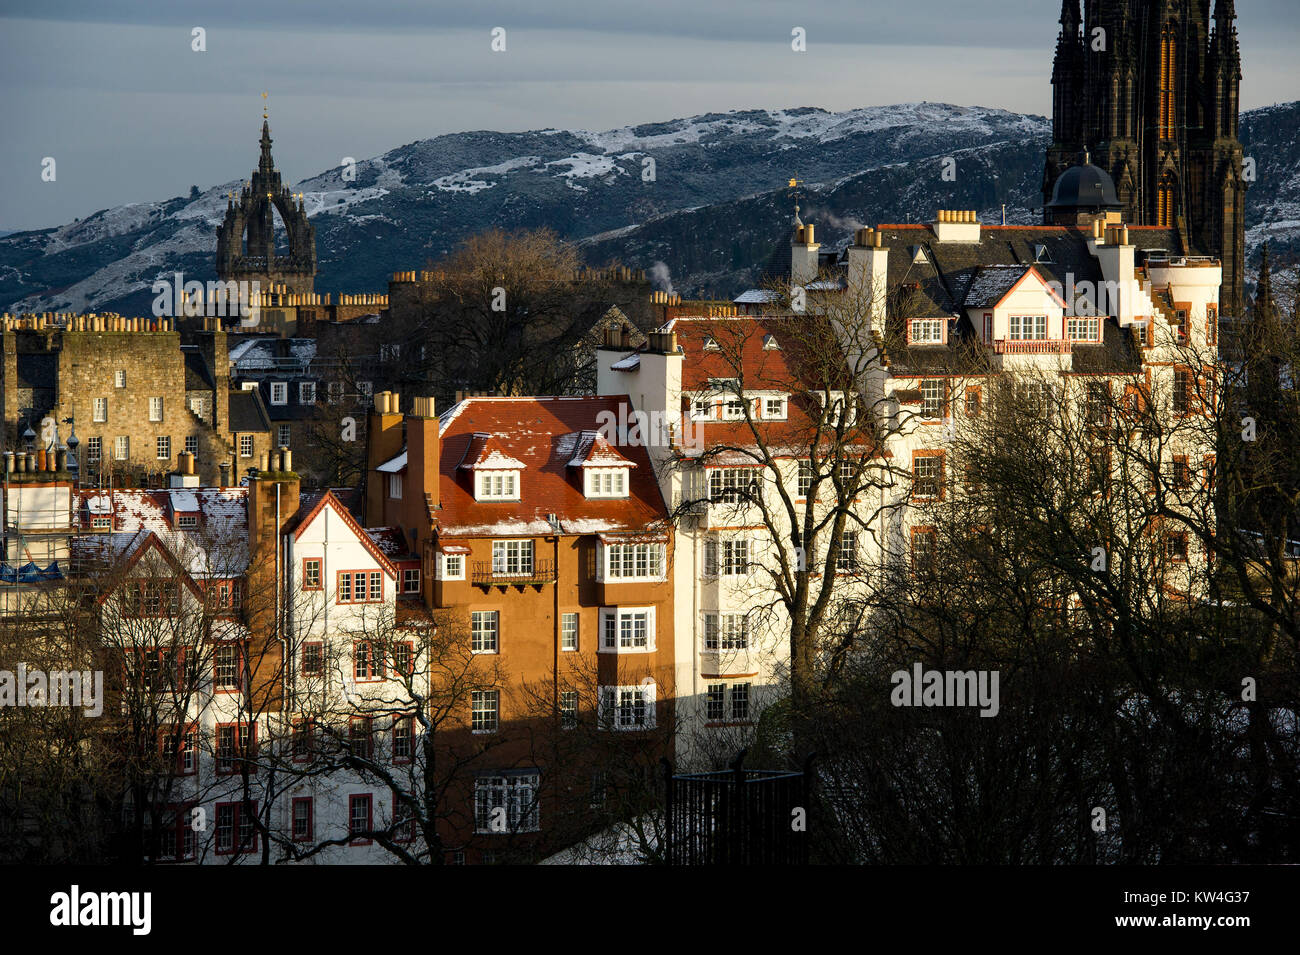 ramsay-garden-below-edinburgh-castle-in-